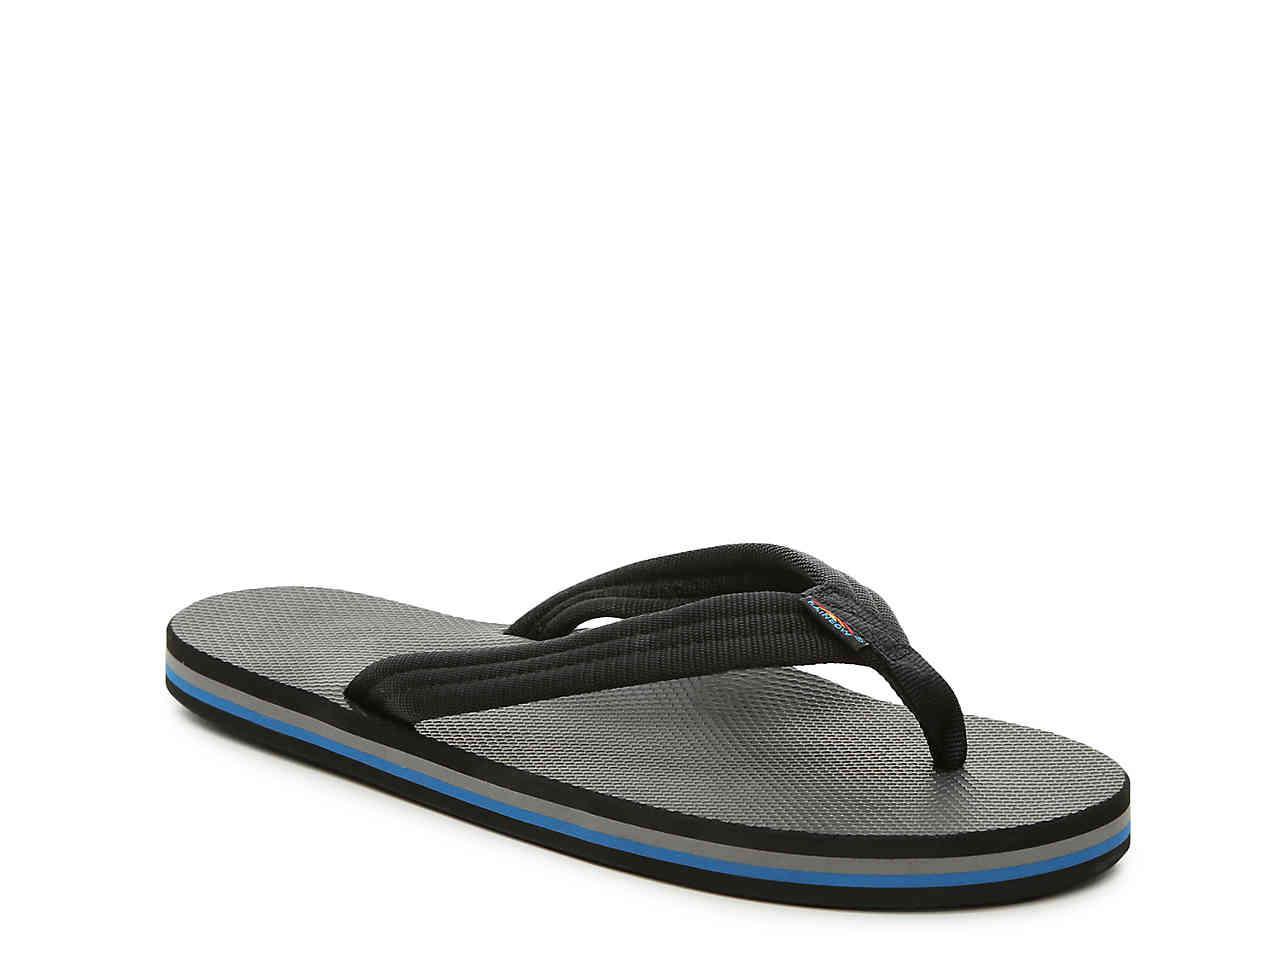 ef1d4891b6f Lyst - Rainbow Sandals Single Layer Classic Flip Flop in Black